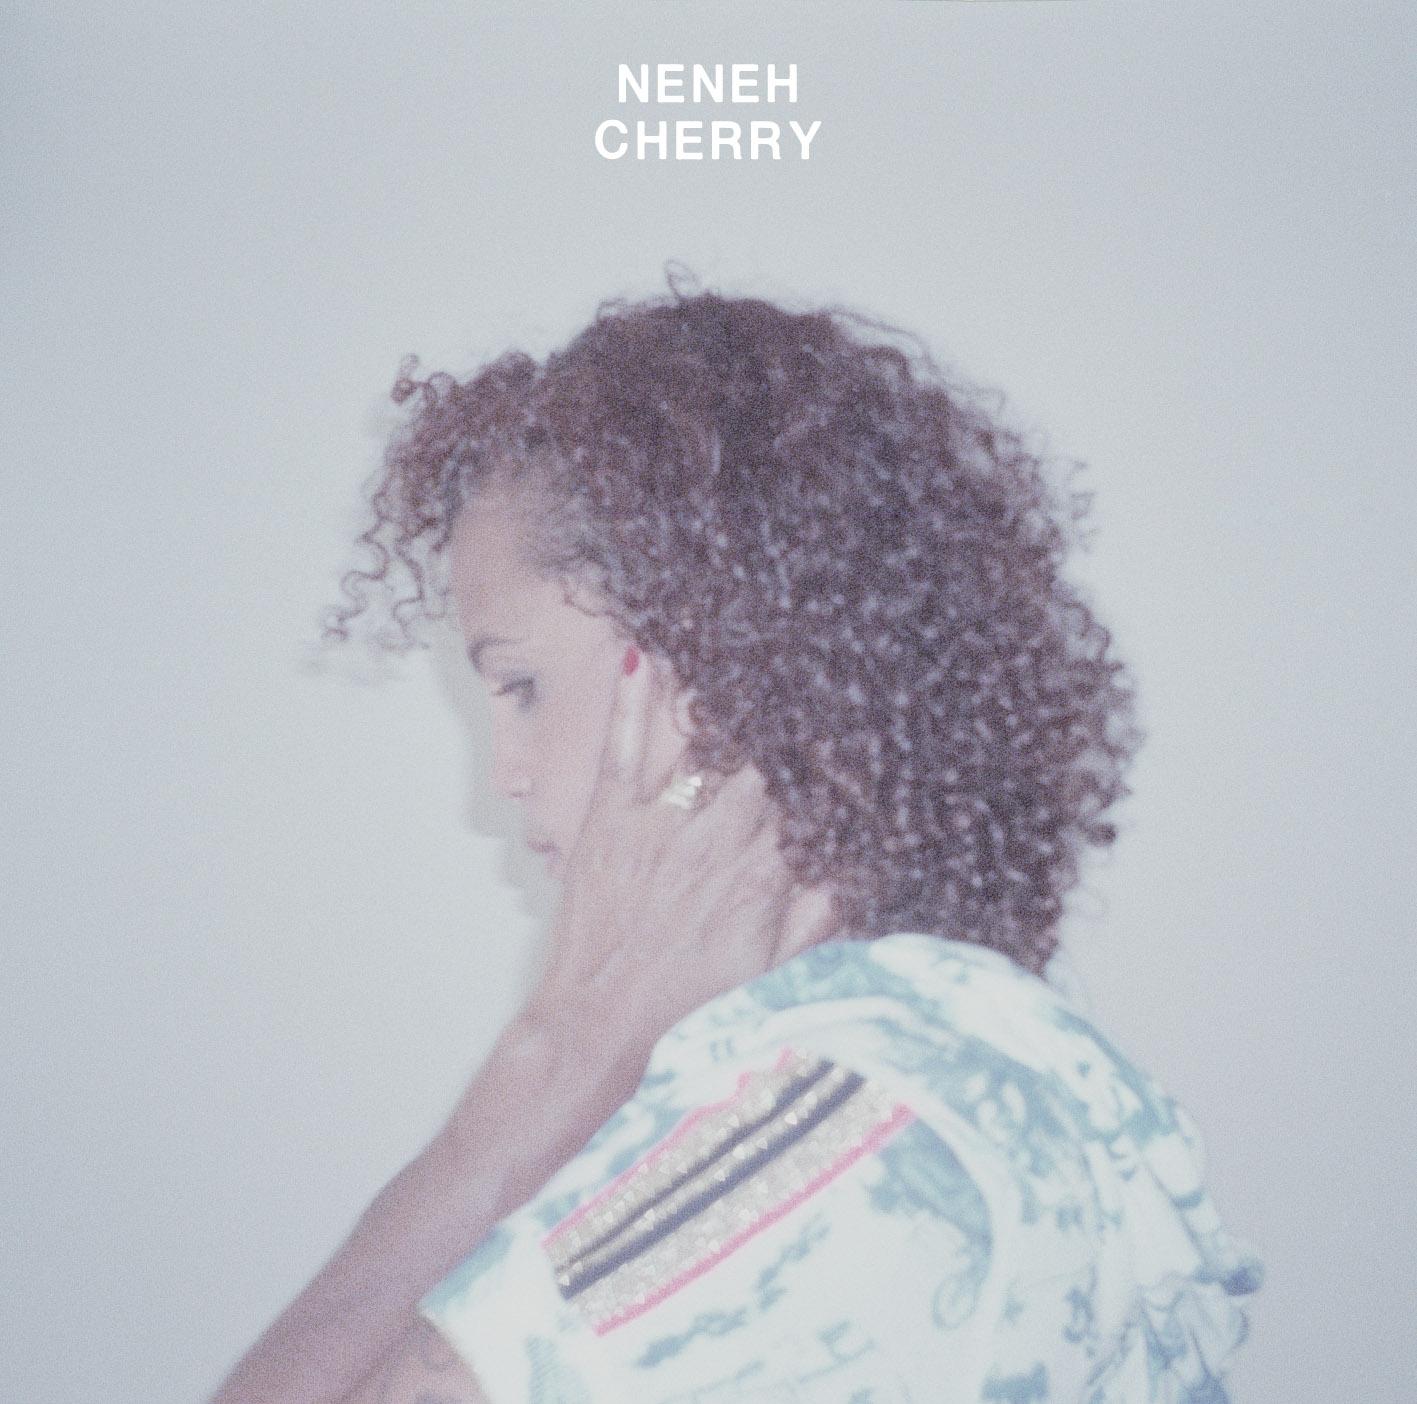 NENEH CHERRY - BLANK PROJECT (SMALLTOWN SUERSOUND, 2014)